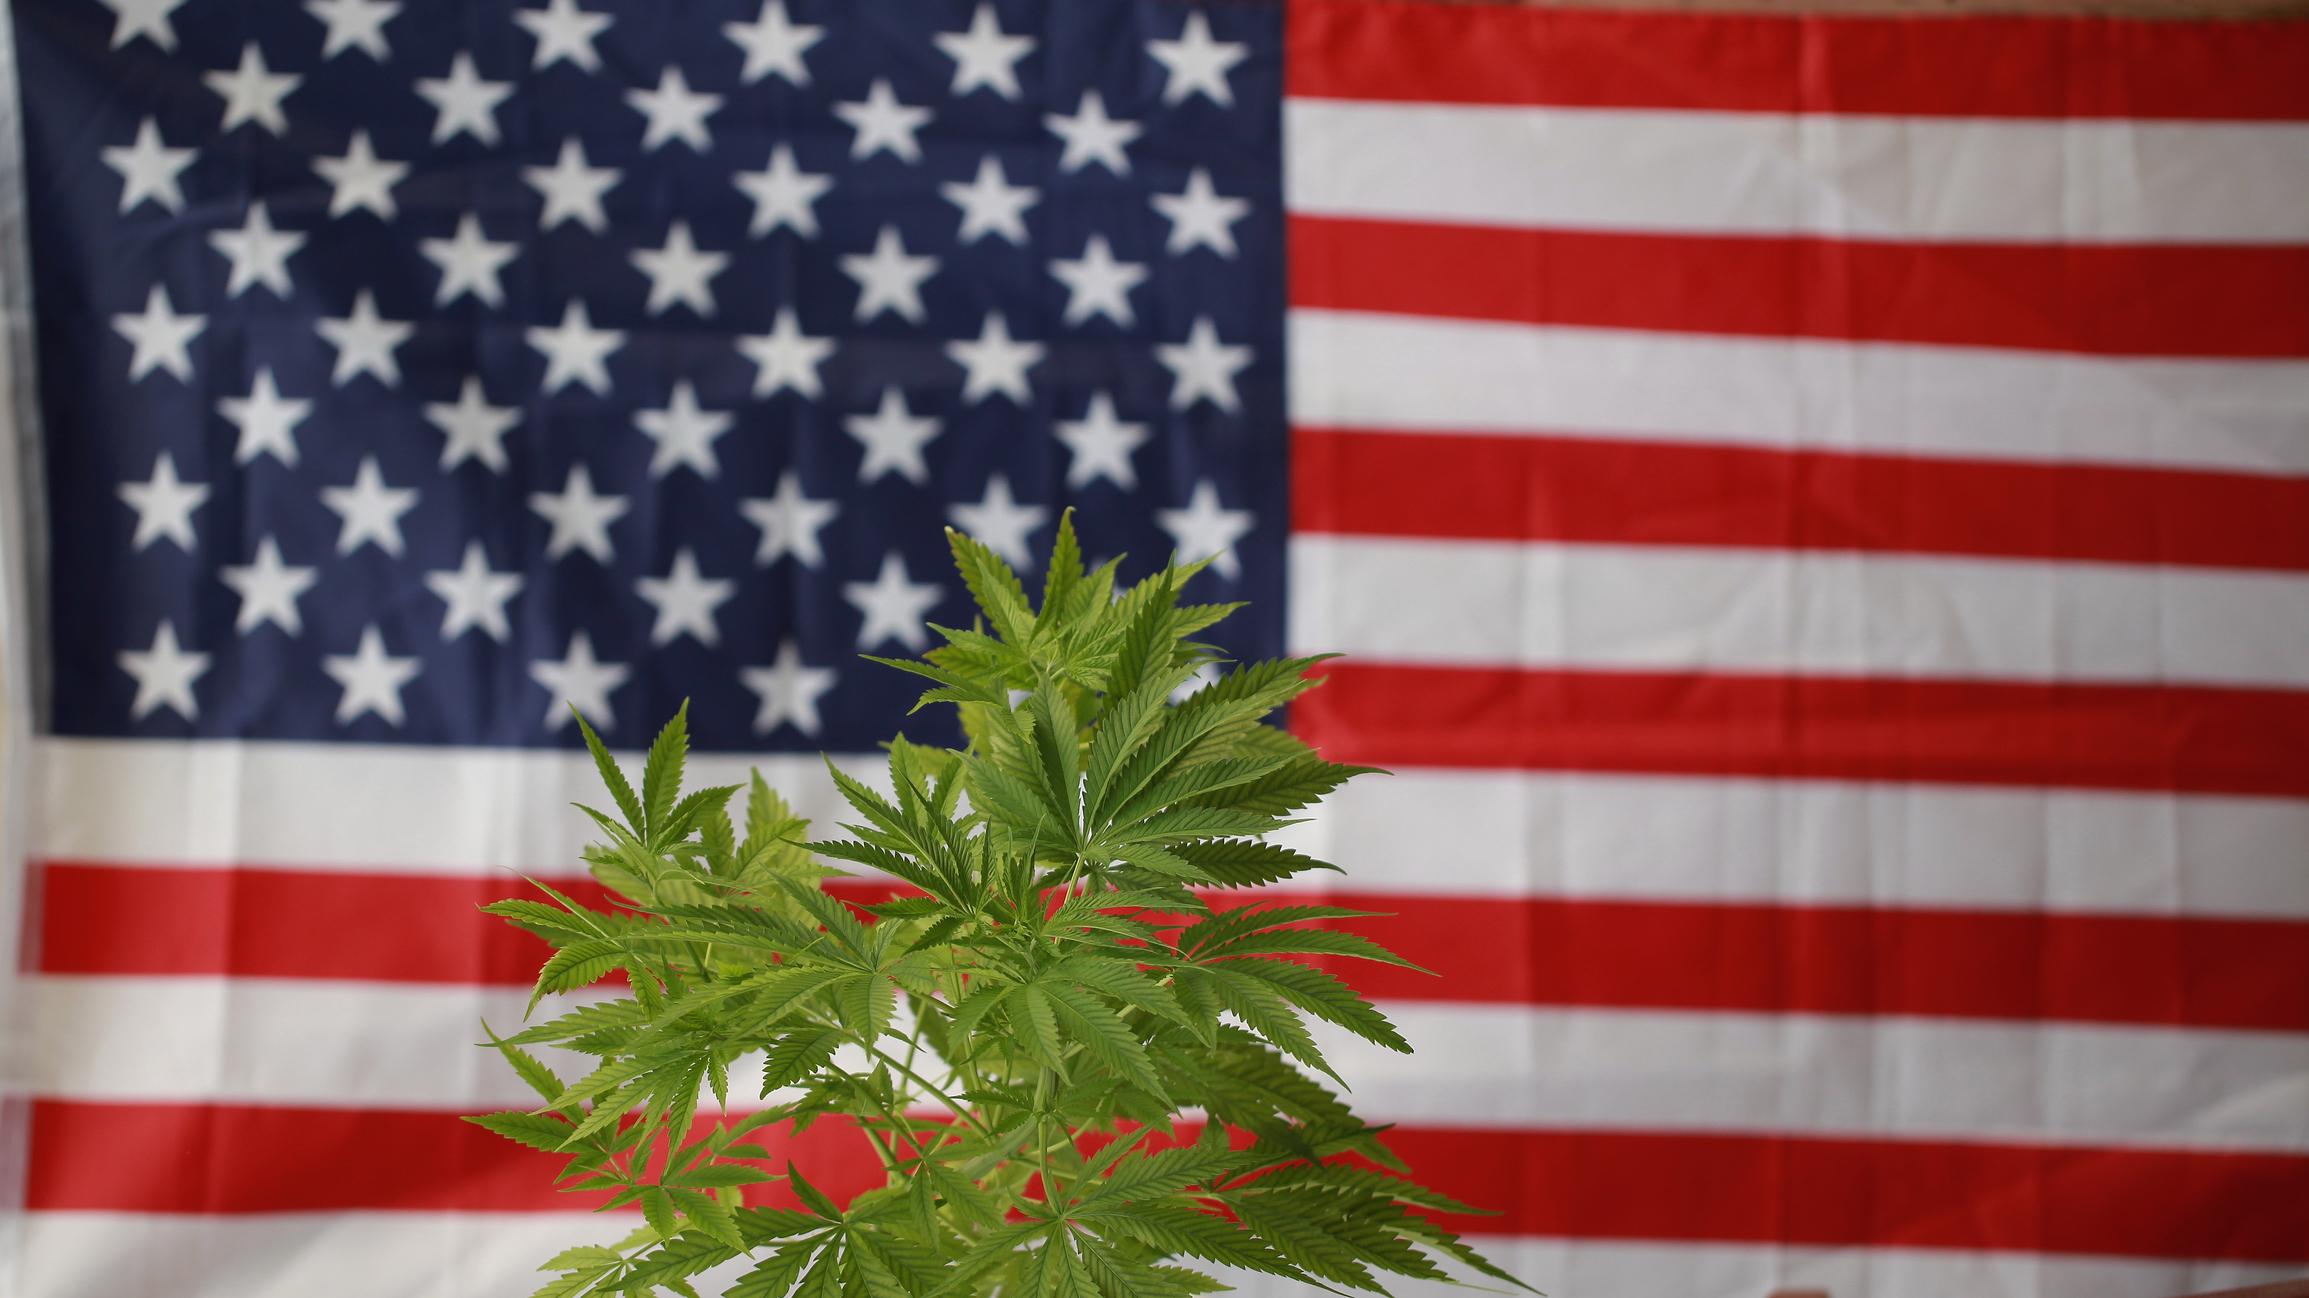 Marijuana Legalization Timeline for the Cannabis Investor | The Motley Fool